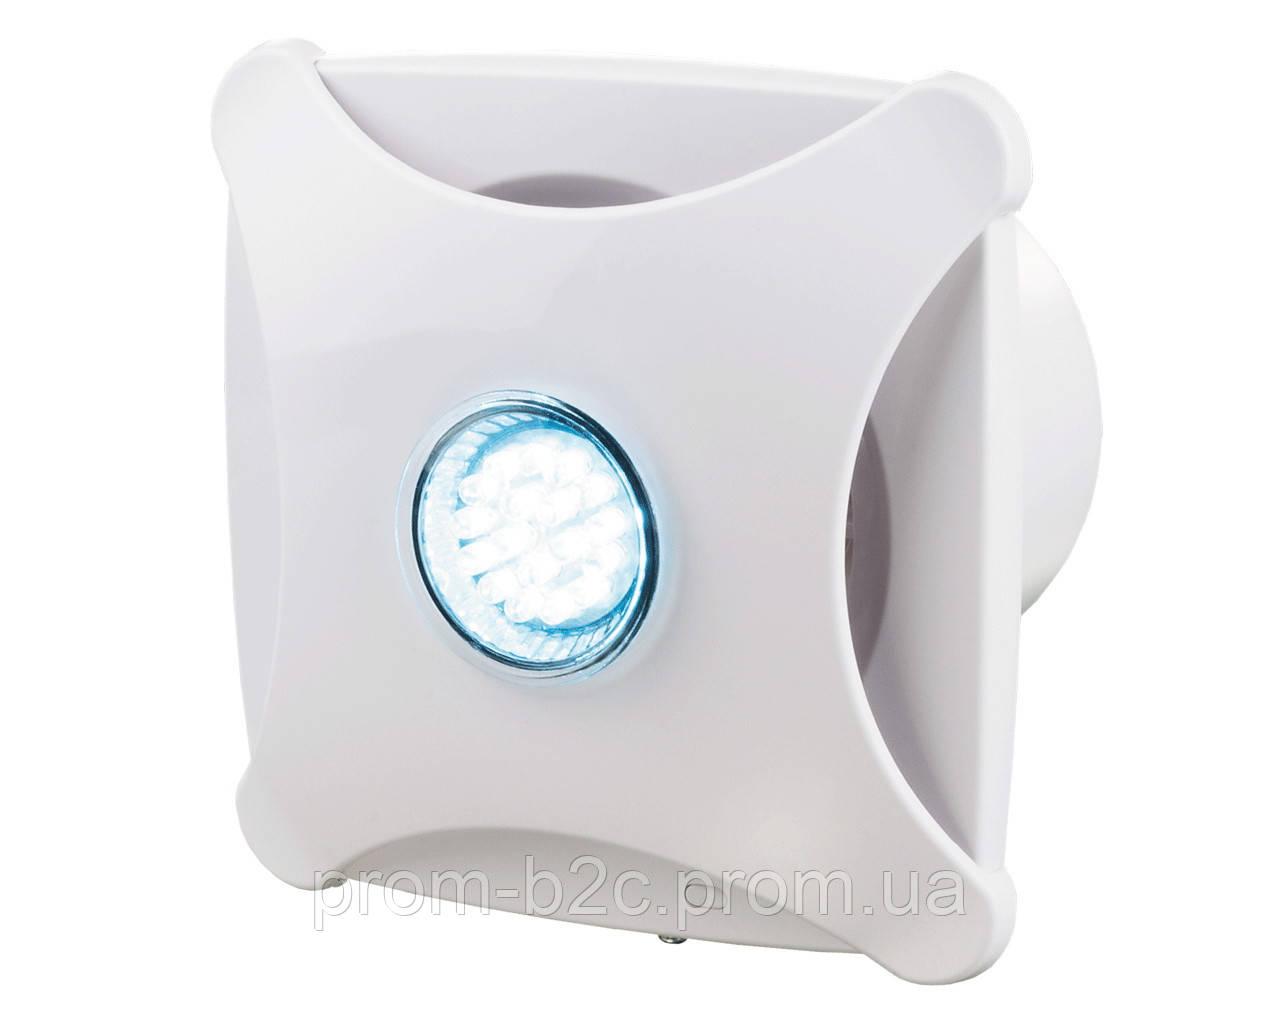 Вентилятор Вентс 125 Х стар